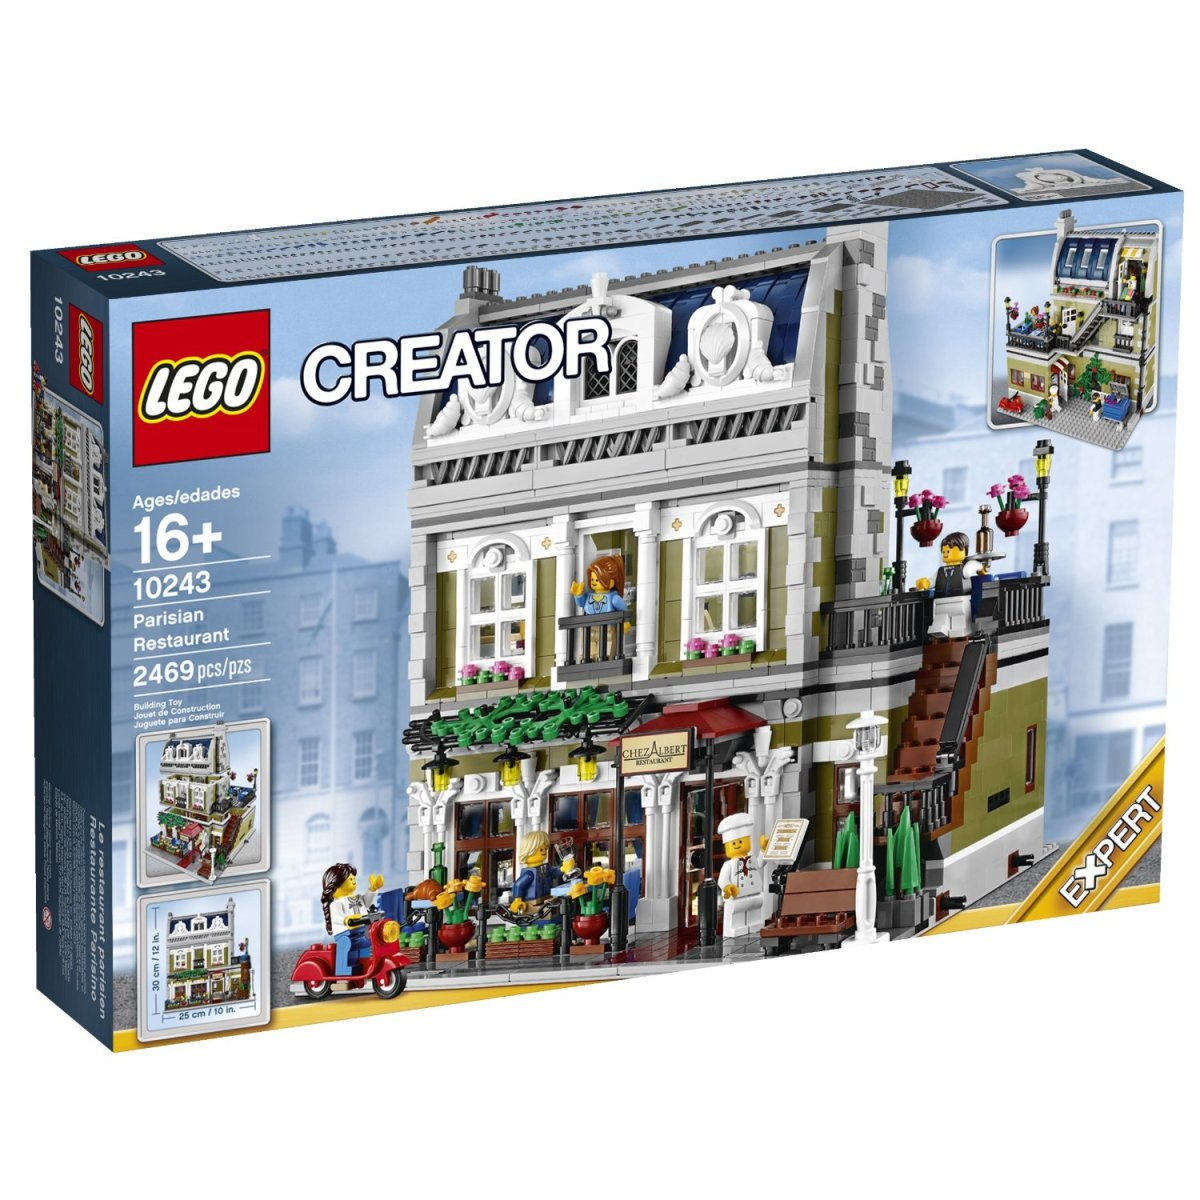 LEGO Creator Parisian Restaurant Modular Building   HubPages